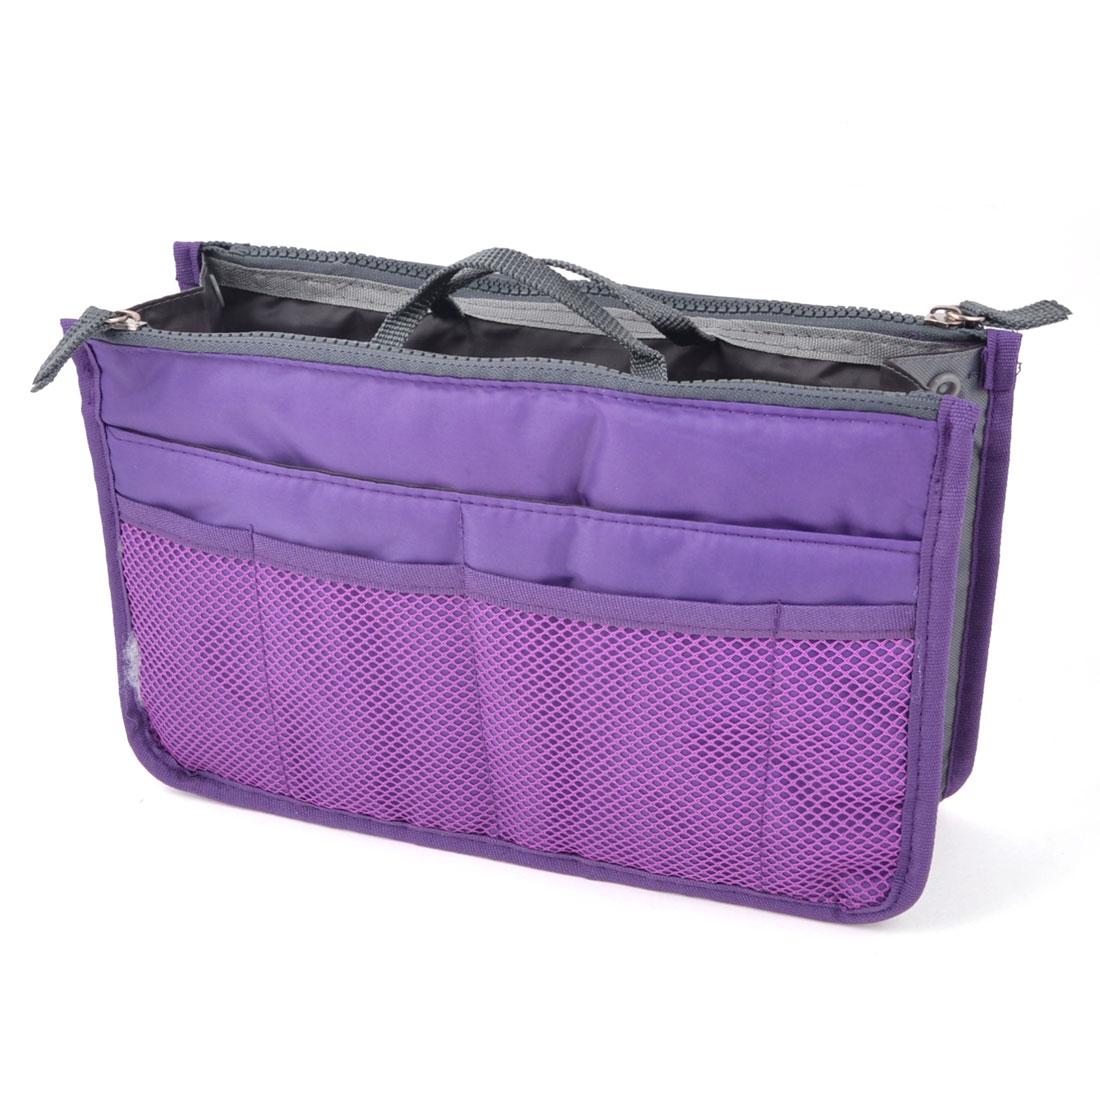 Multifunction Zipper Closure Pockets Purse Storage Bag Pouch Organizer Purple